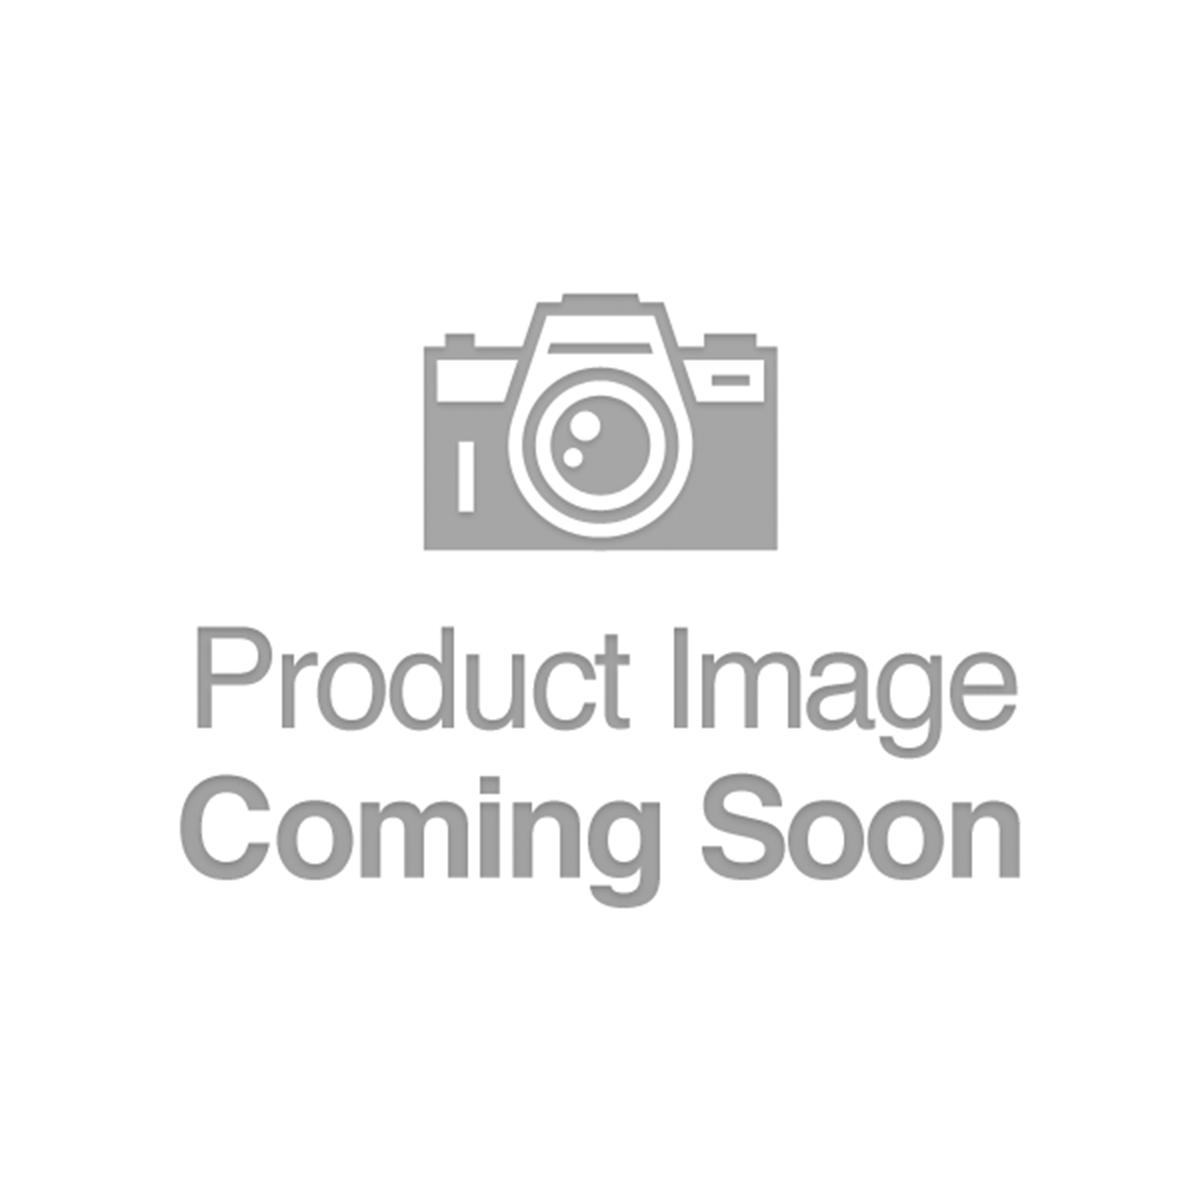 Bridgeton - New Jersey - CH 1346 - FR 587 - PCGS 64 PPQ